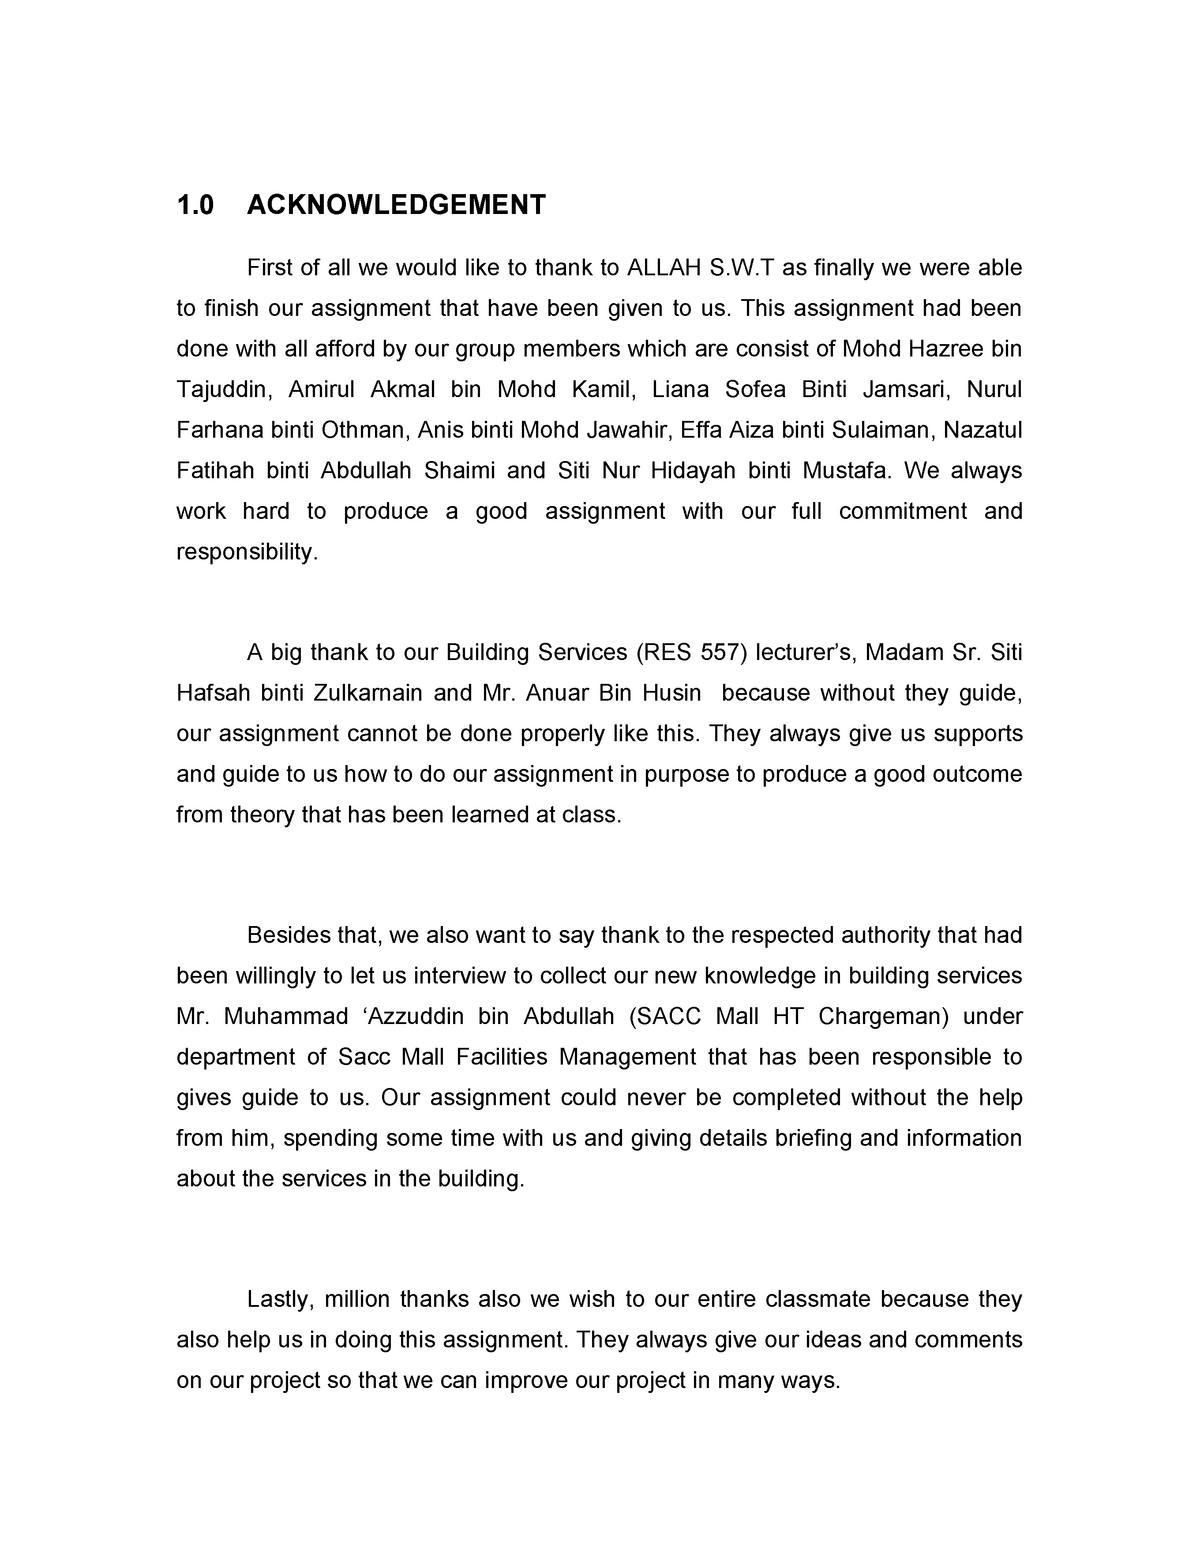 Building Services Assignment Written By Hazree Tajuddin Studocu